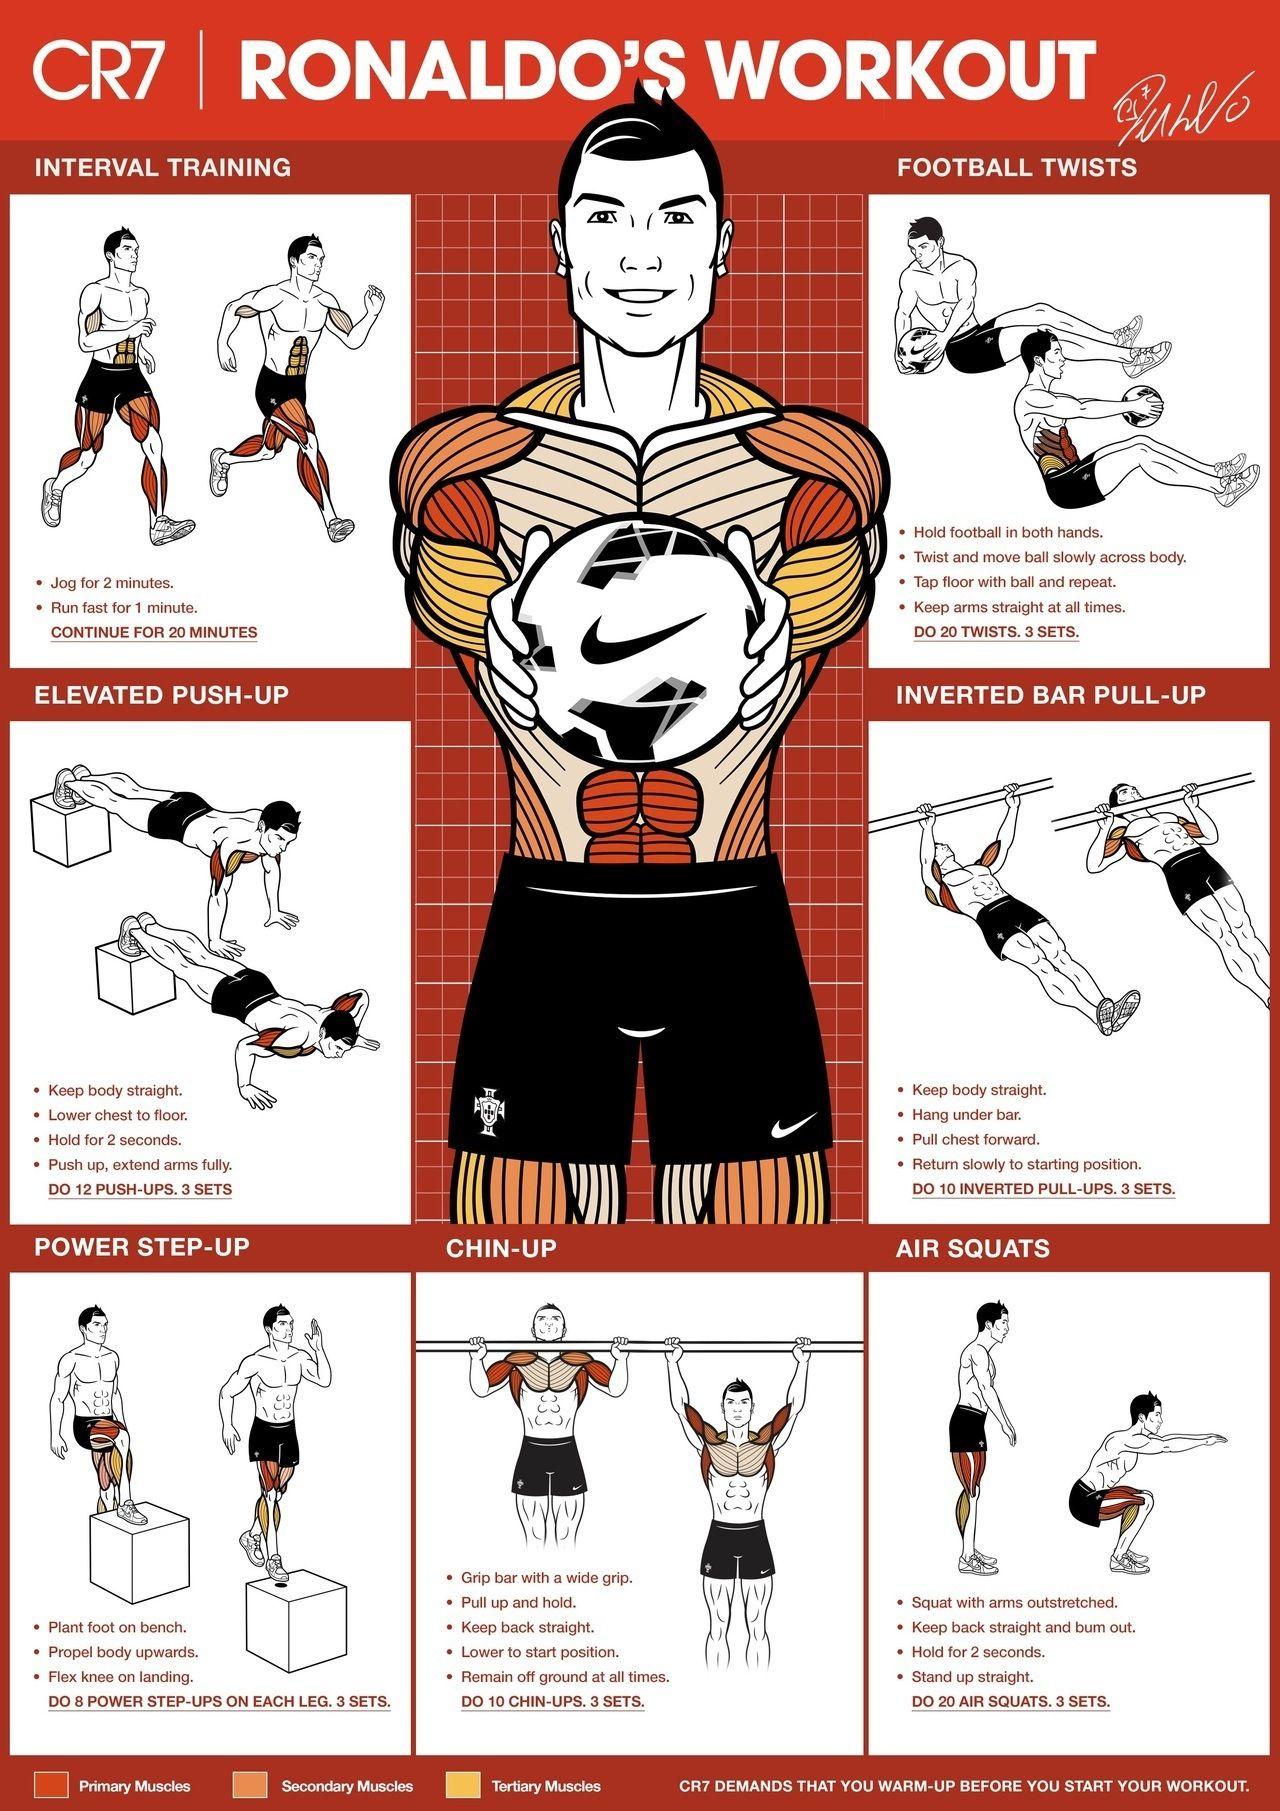 CR7/Christiano Ronaldo workout | football | Soccer workouts